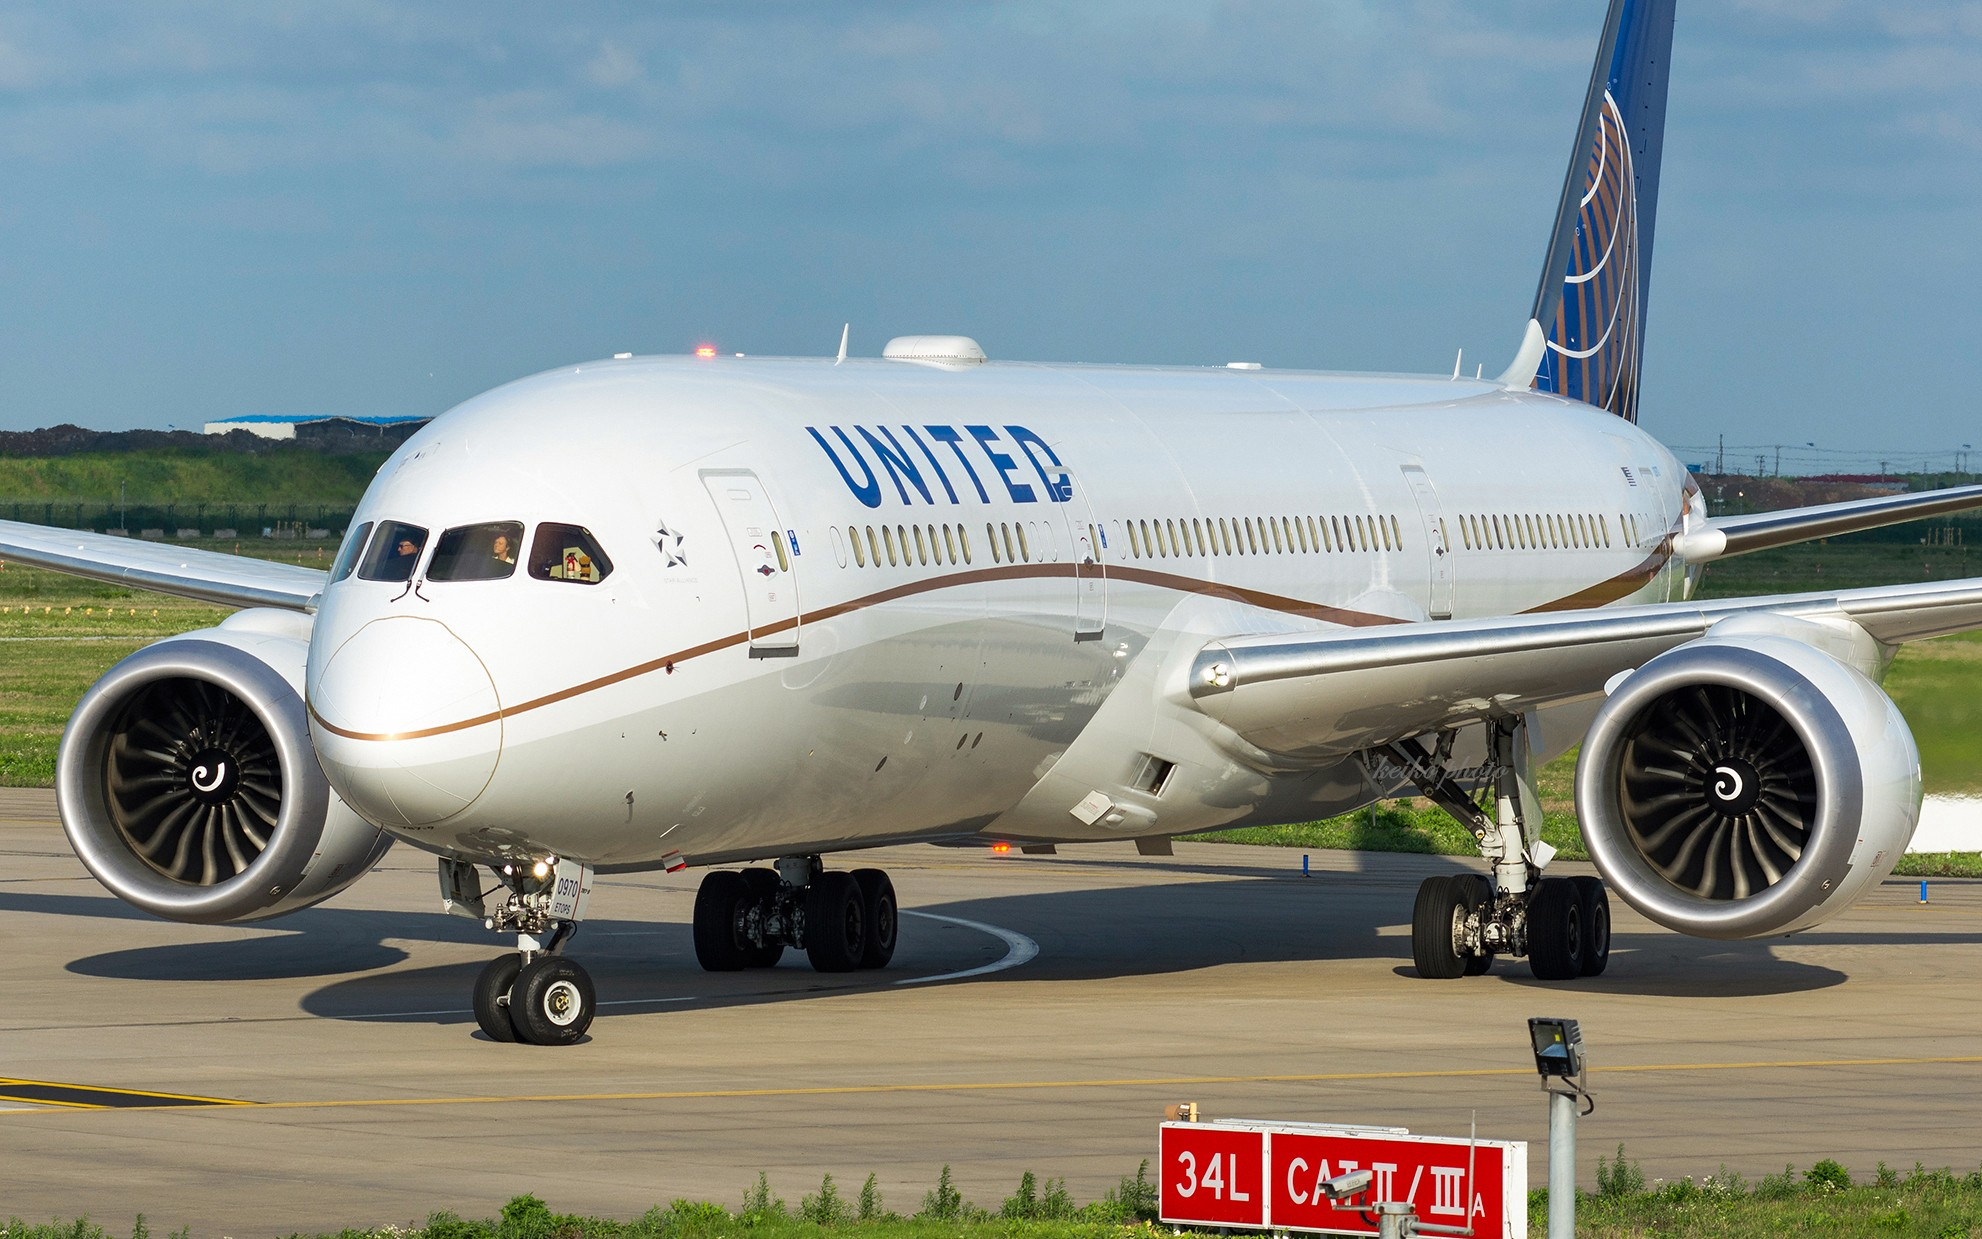 Re:[原创]发图讲话 BOEING 787-9 N26970 中国上海浦东国际机场